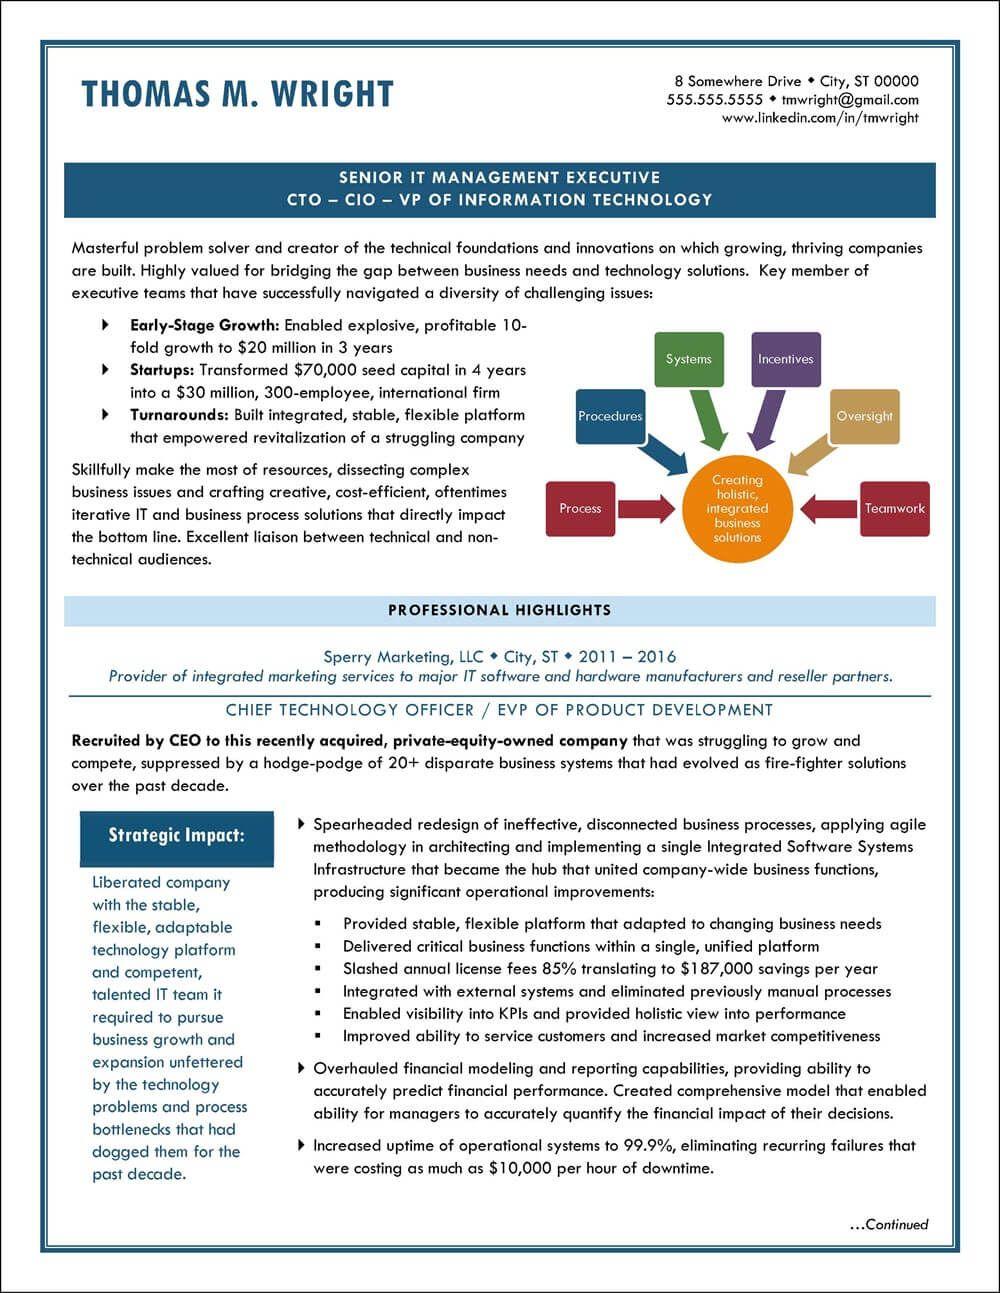 Example Executive Resume - CTO/CIO- pg1 | Resume Examples | Pinterest